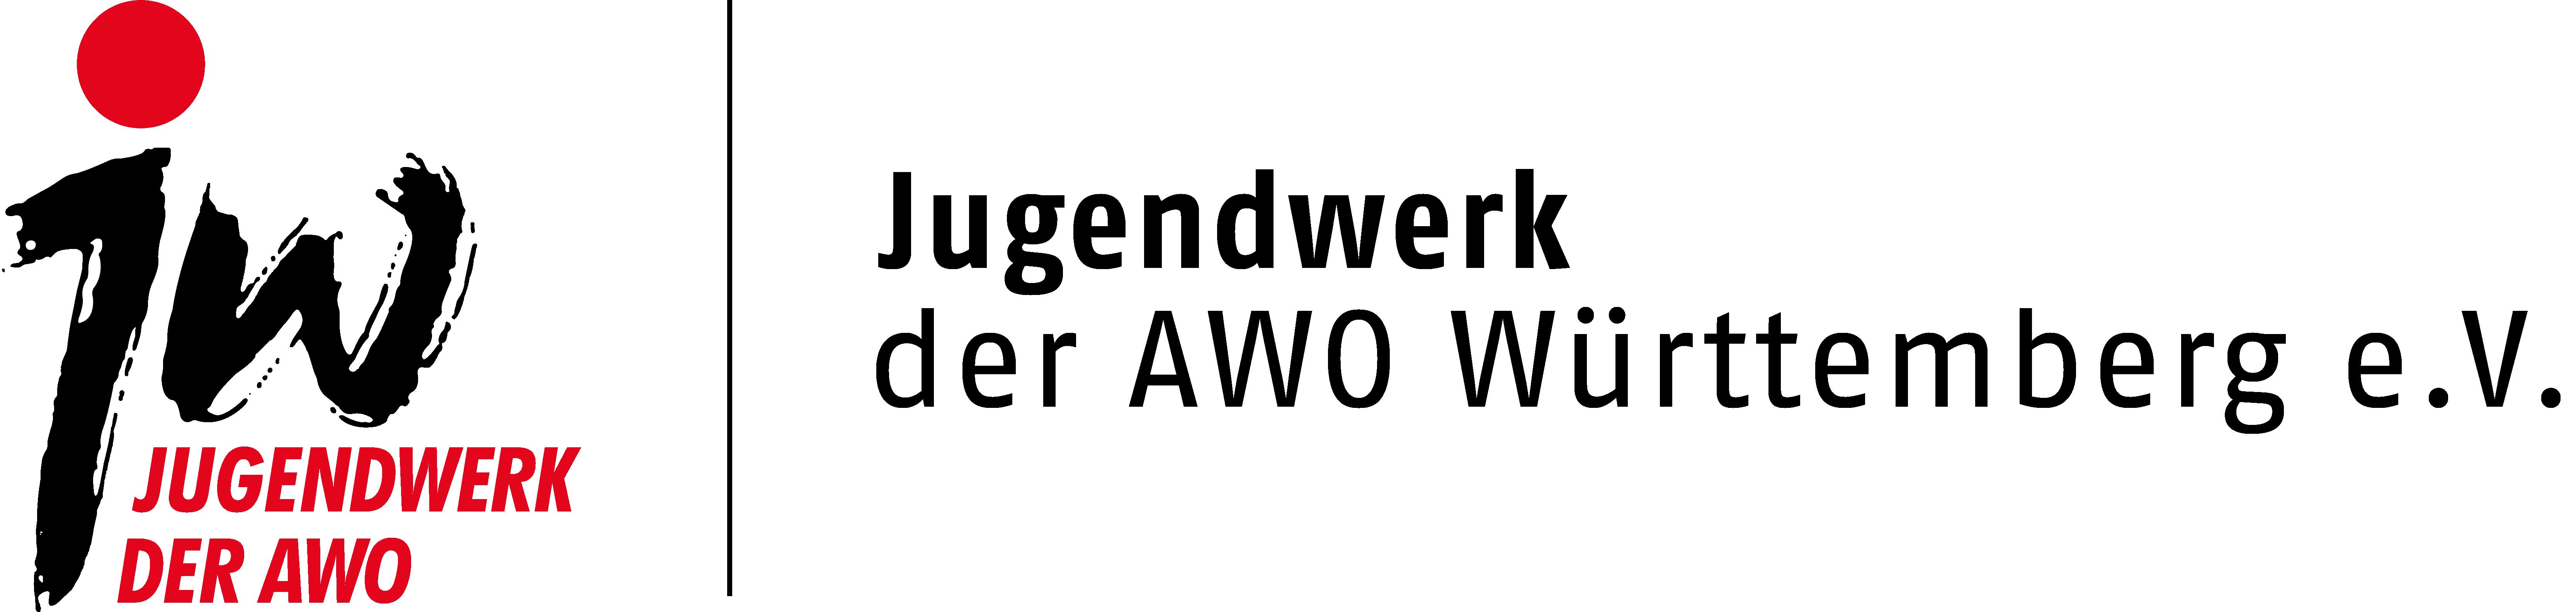 jw_logo_black